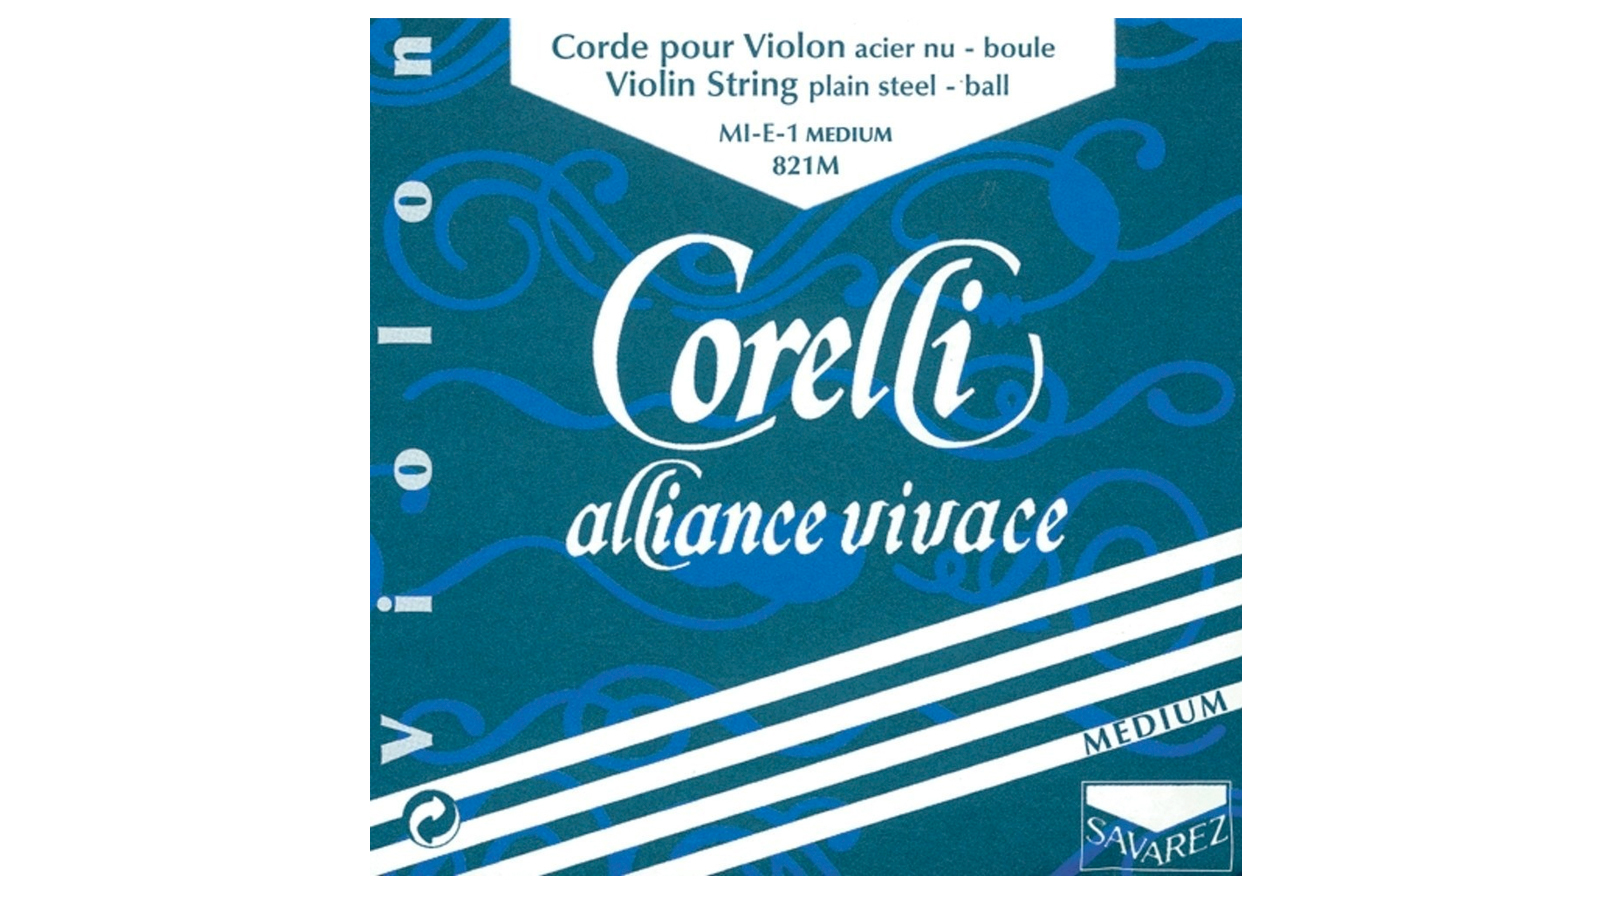 Corelli Violinensaite A Medium